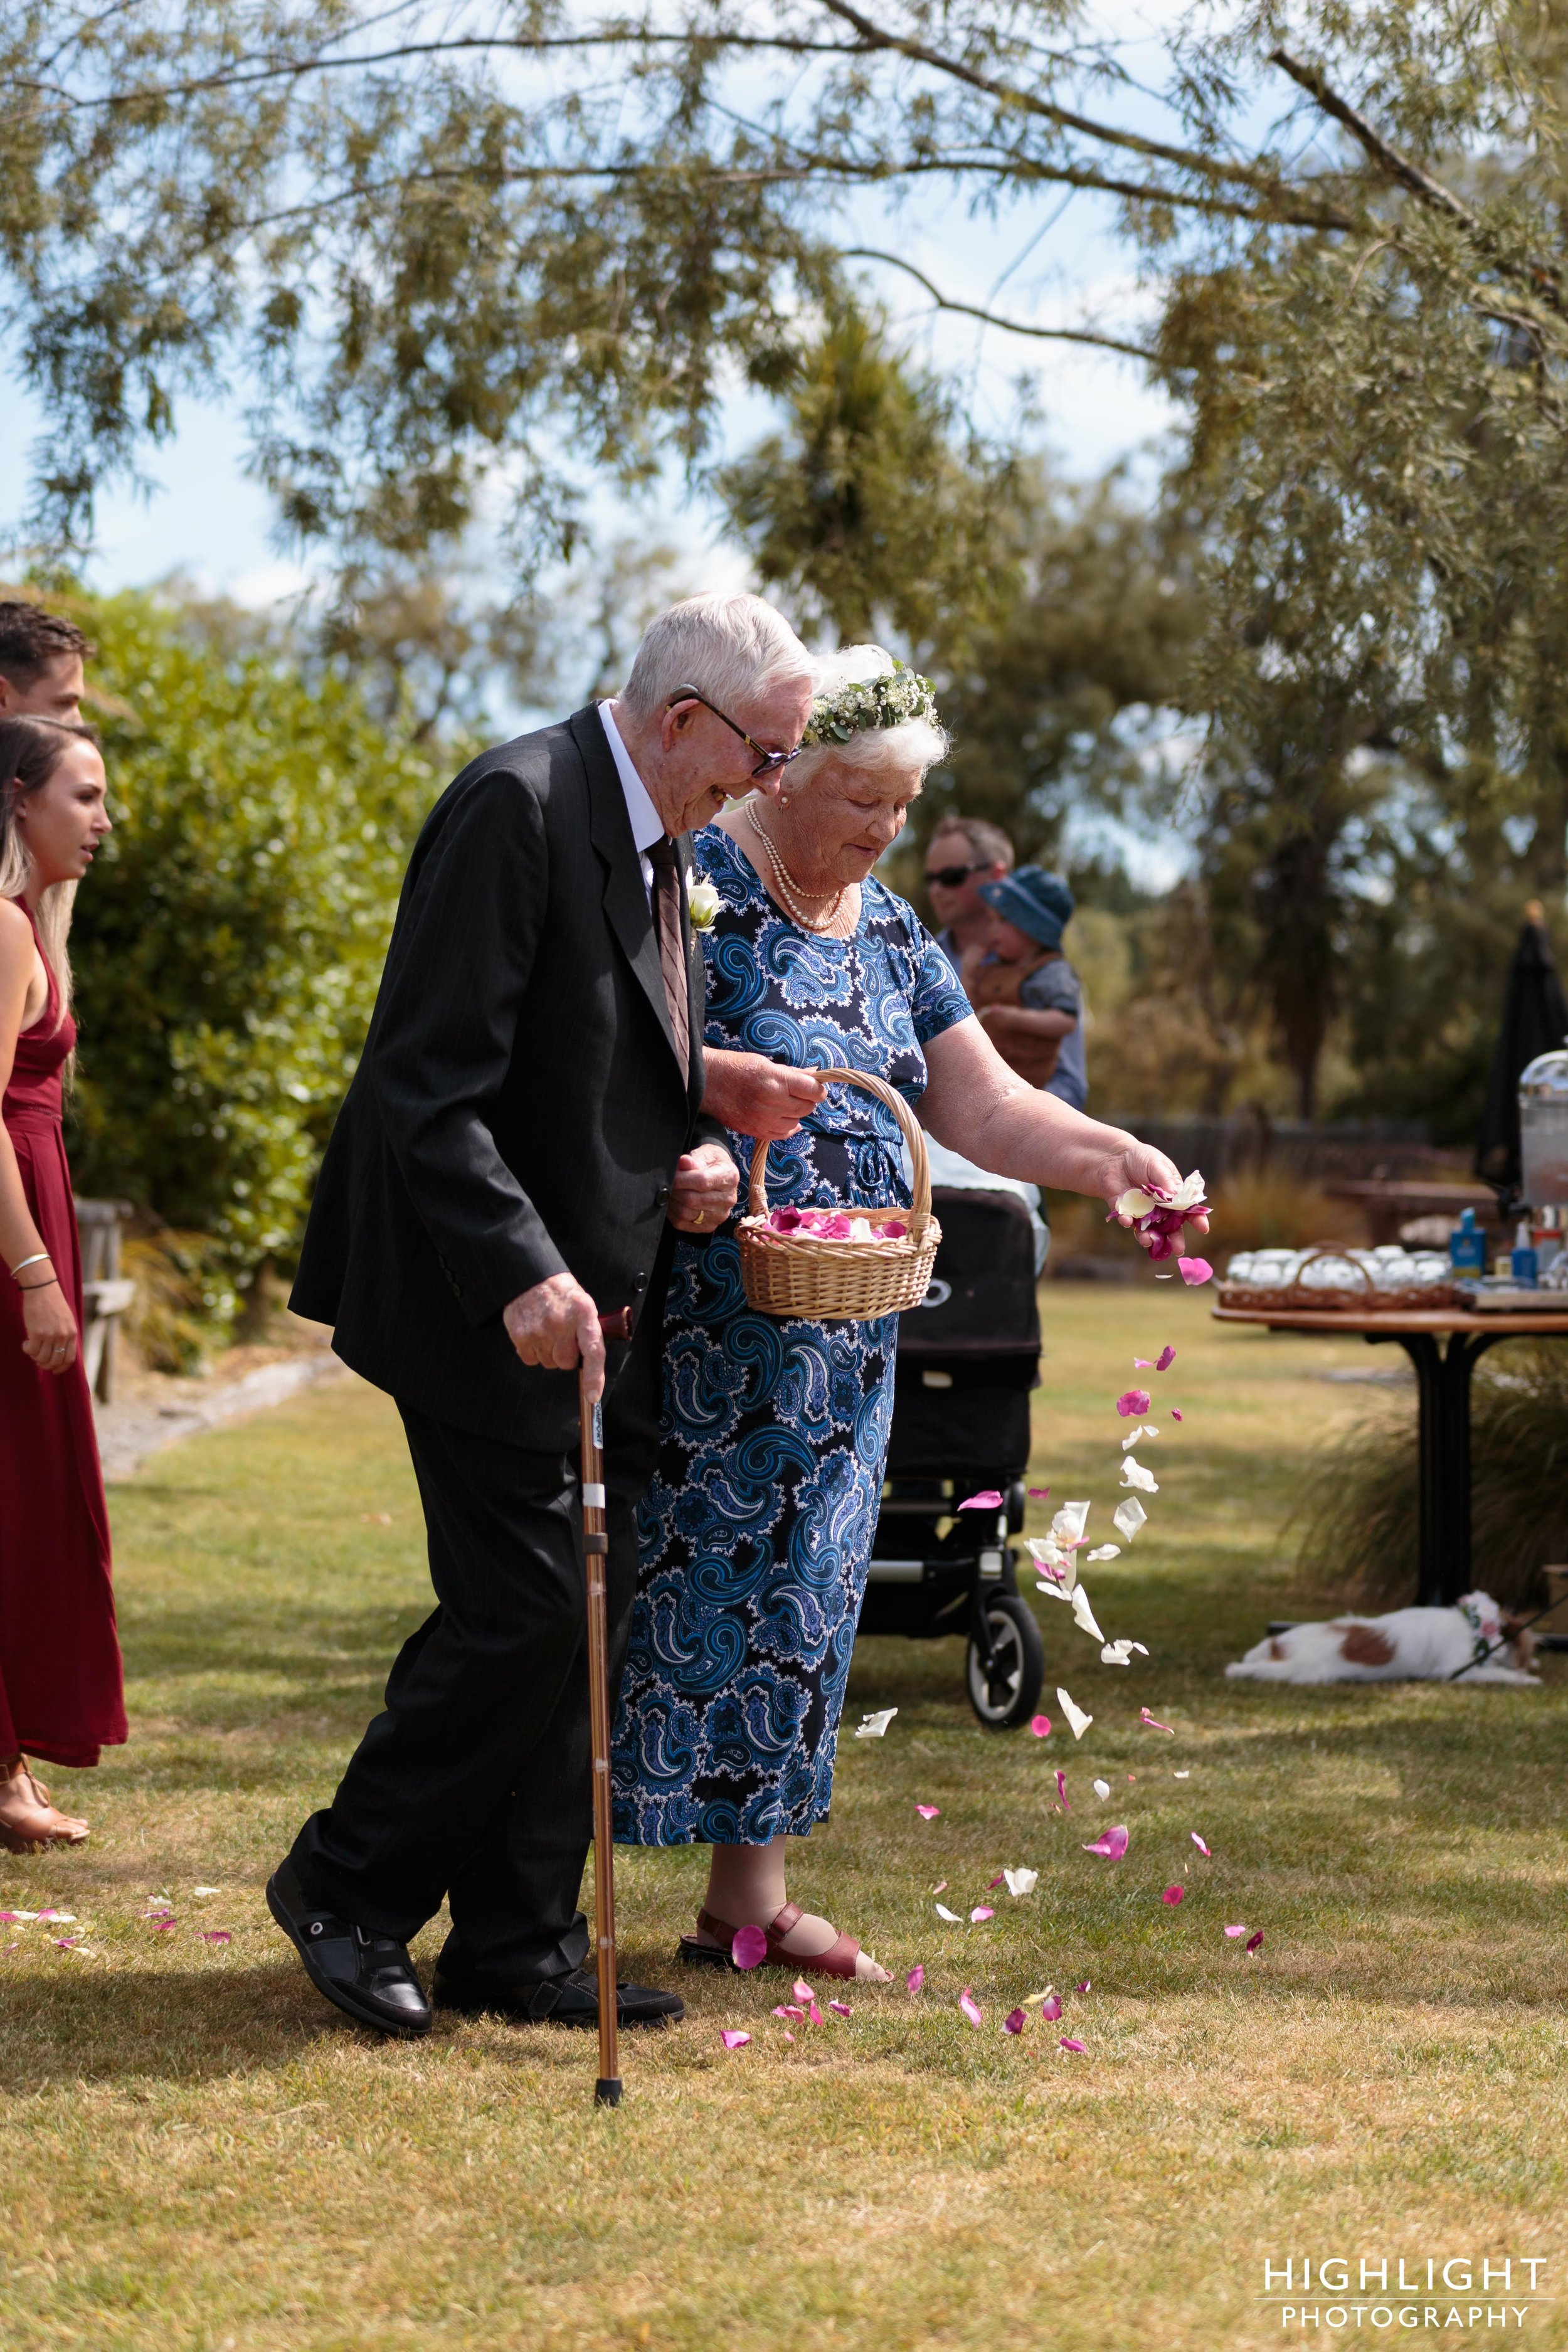 highlight-wedding-photography-new-zealand-makoura-lodge-wedding-49.jpg